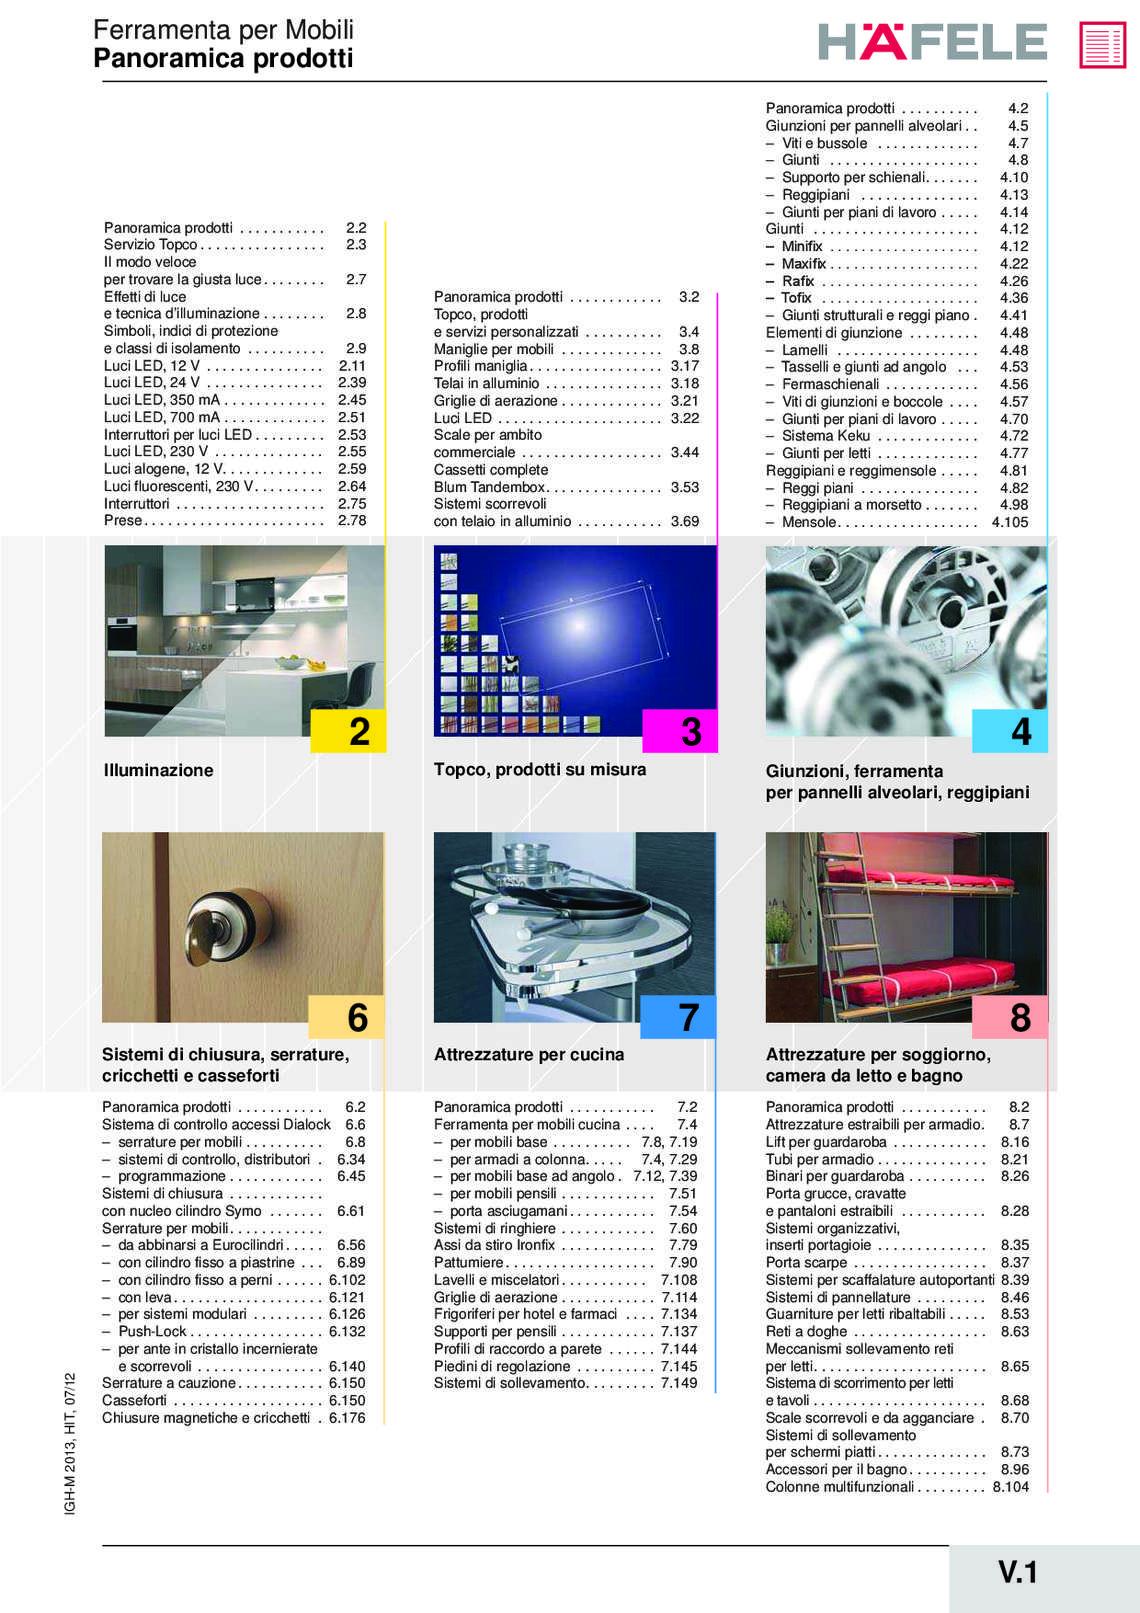 hafele-prodotti-su-misura_81_002.jpg